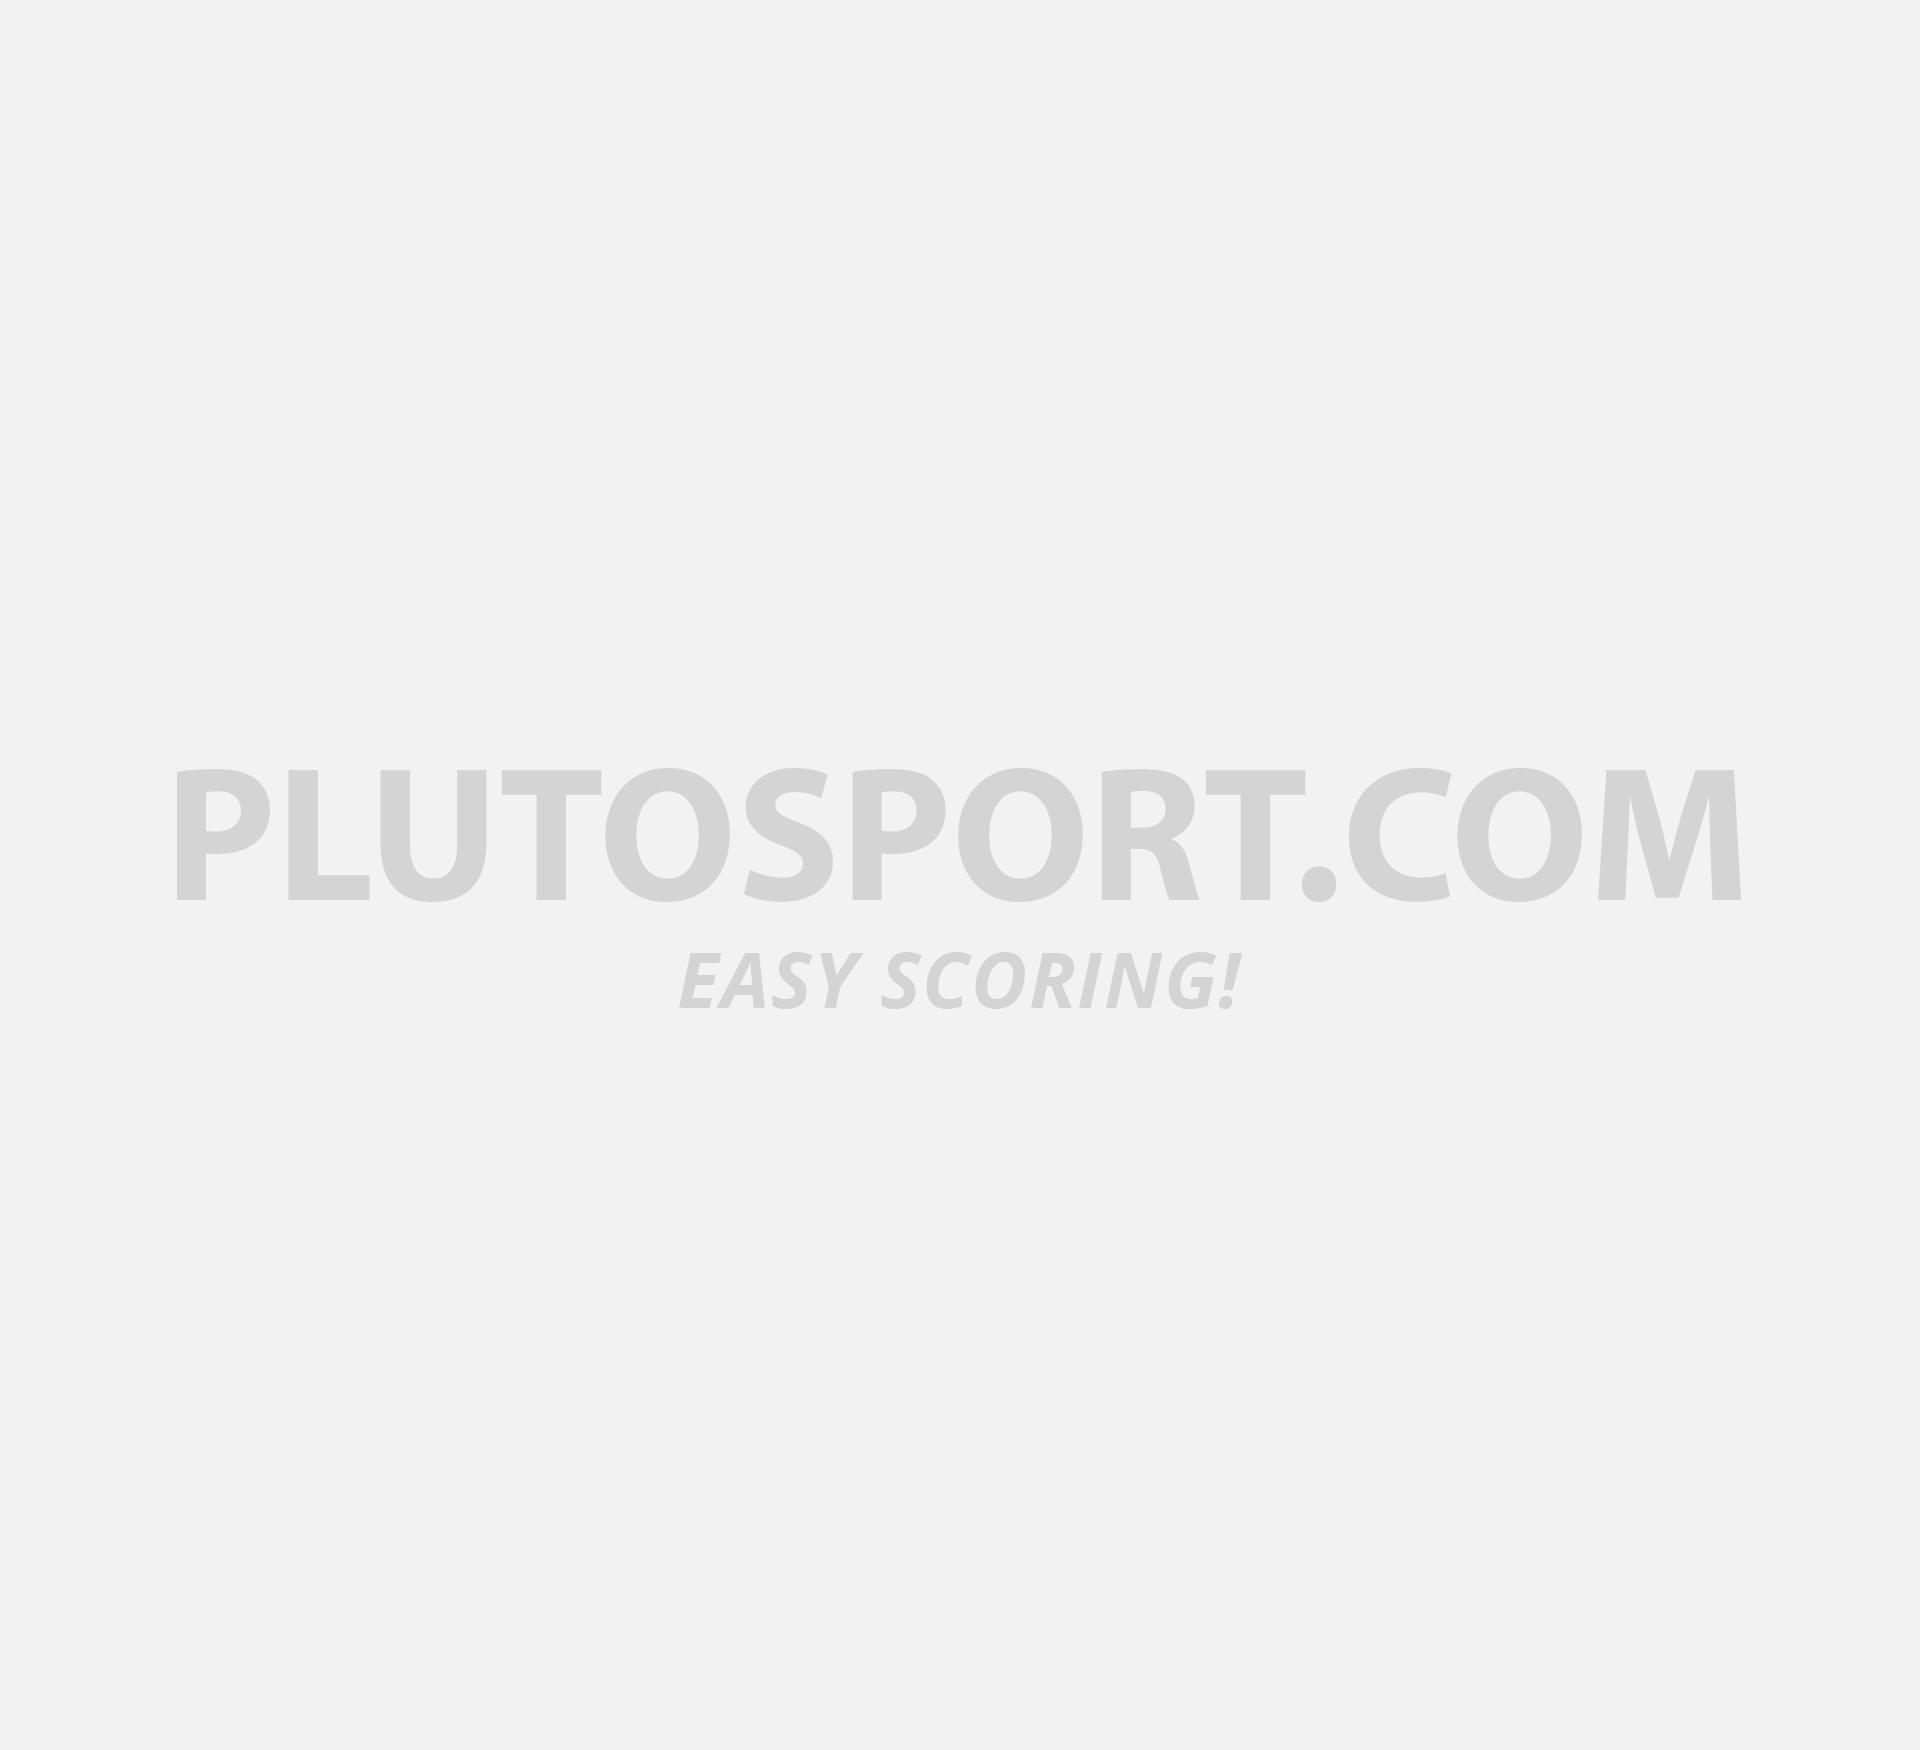 443c88e62a93 Fila Thora Track Pants - Sweat - Pants - Clothing - Lifestyle - Sports |  Plutosport